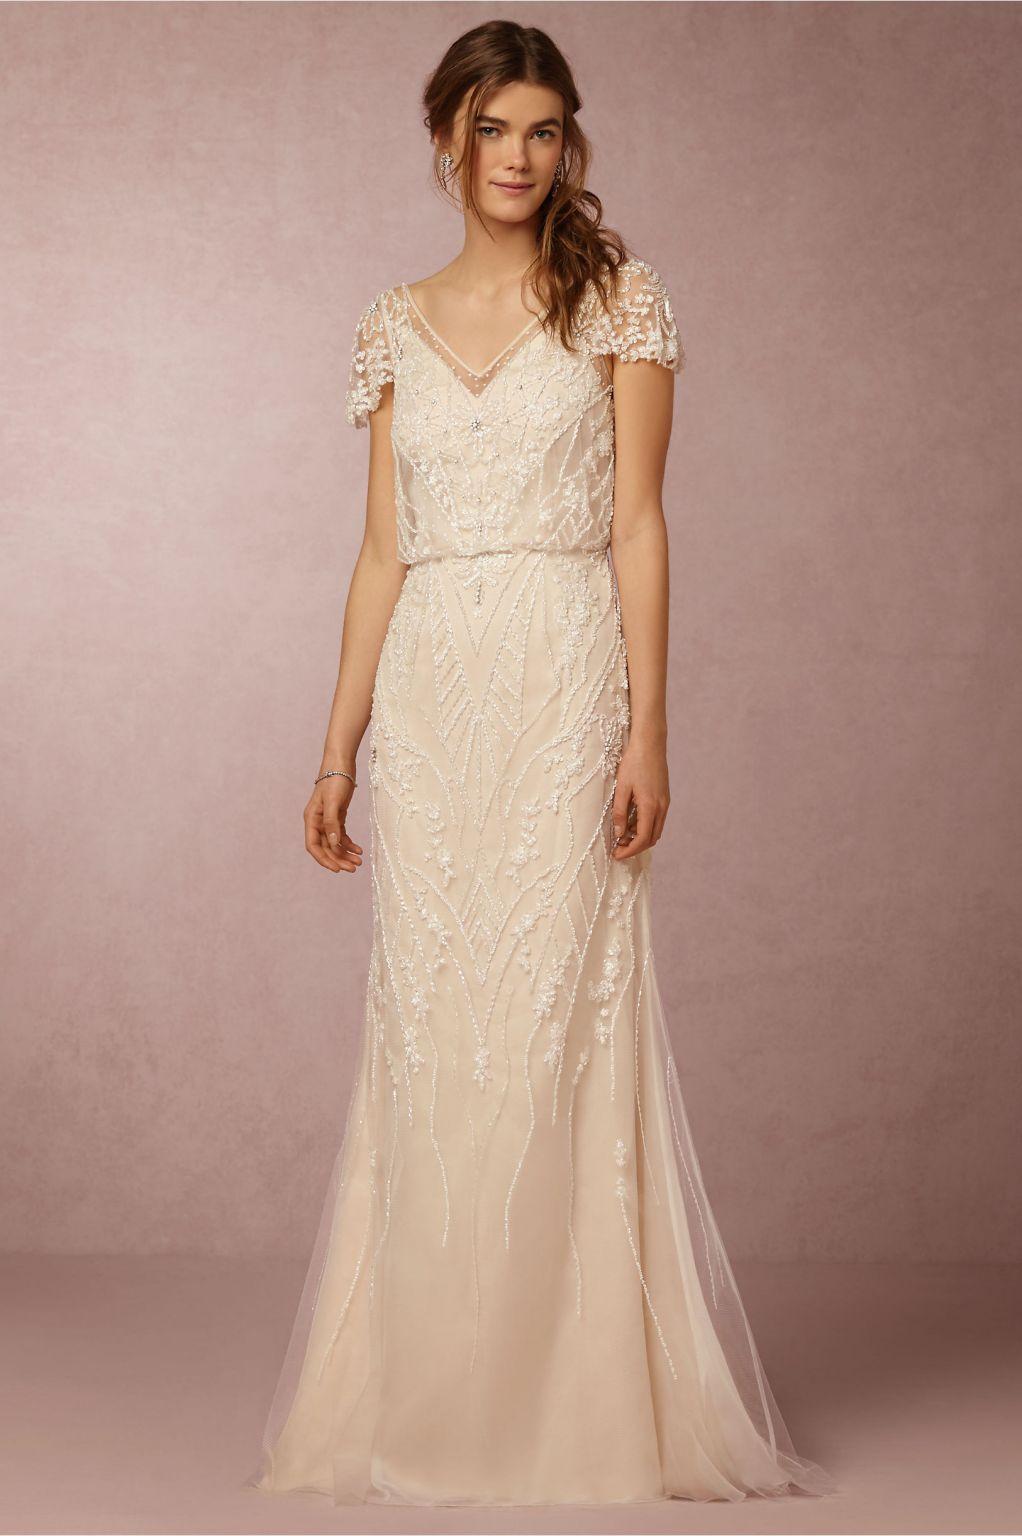 Bhldn Etoile Aurora Gown 37819745 Wedding Dress Used Size 2